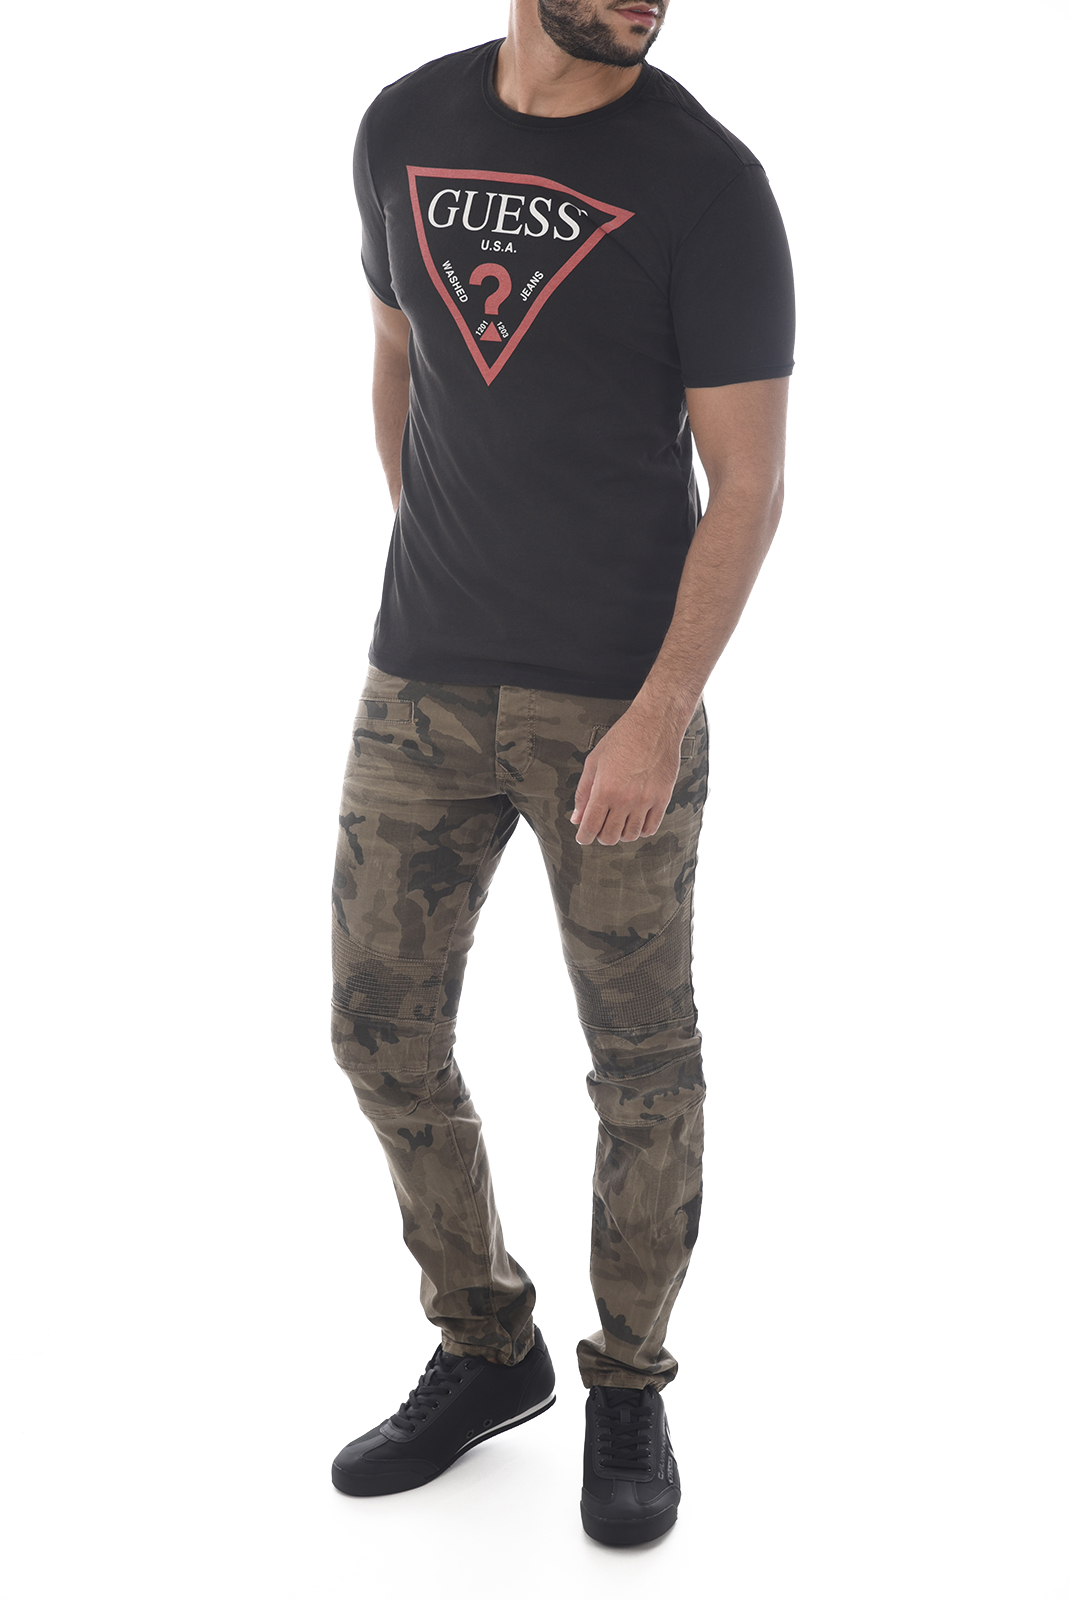 T-S manches courtes  Guess jeans M83I27 J1300 F9Z6 BLACK LIGHT